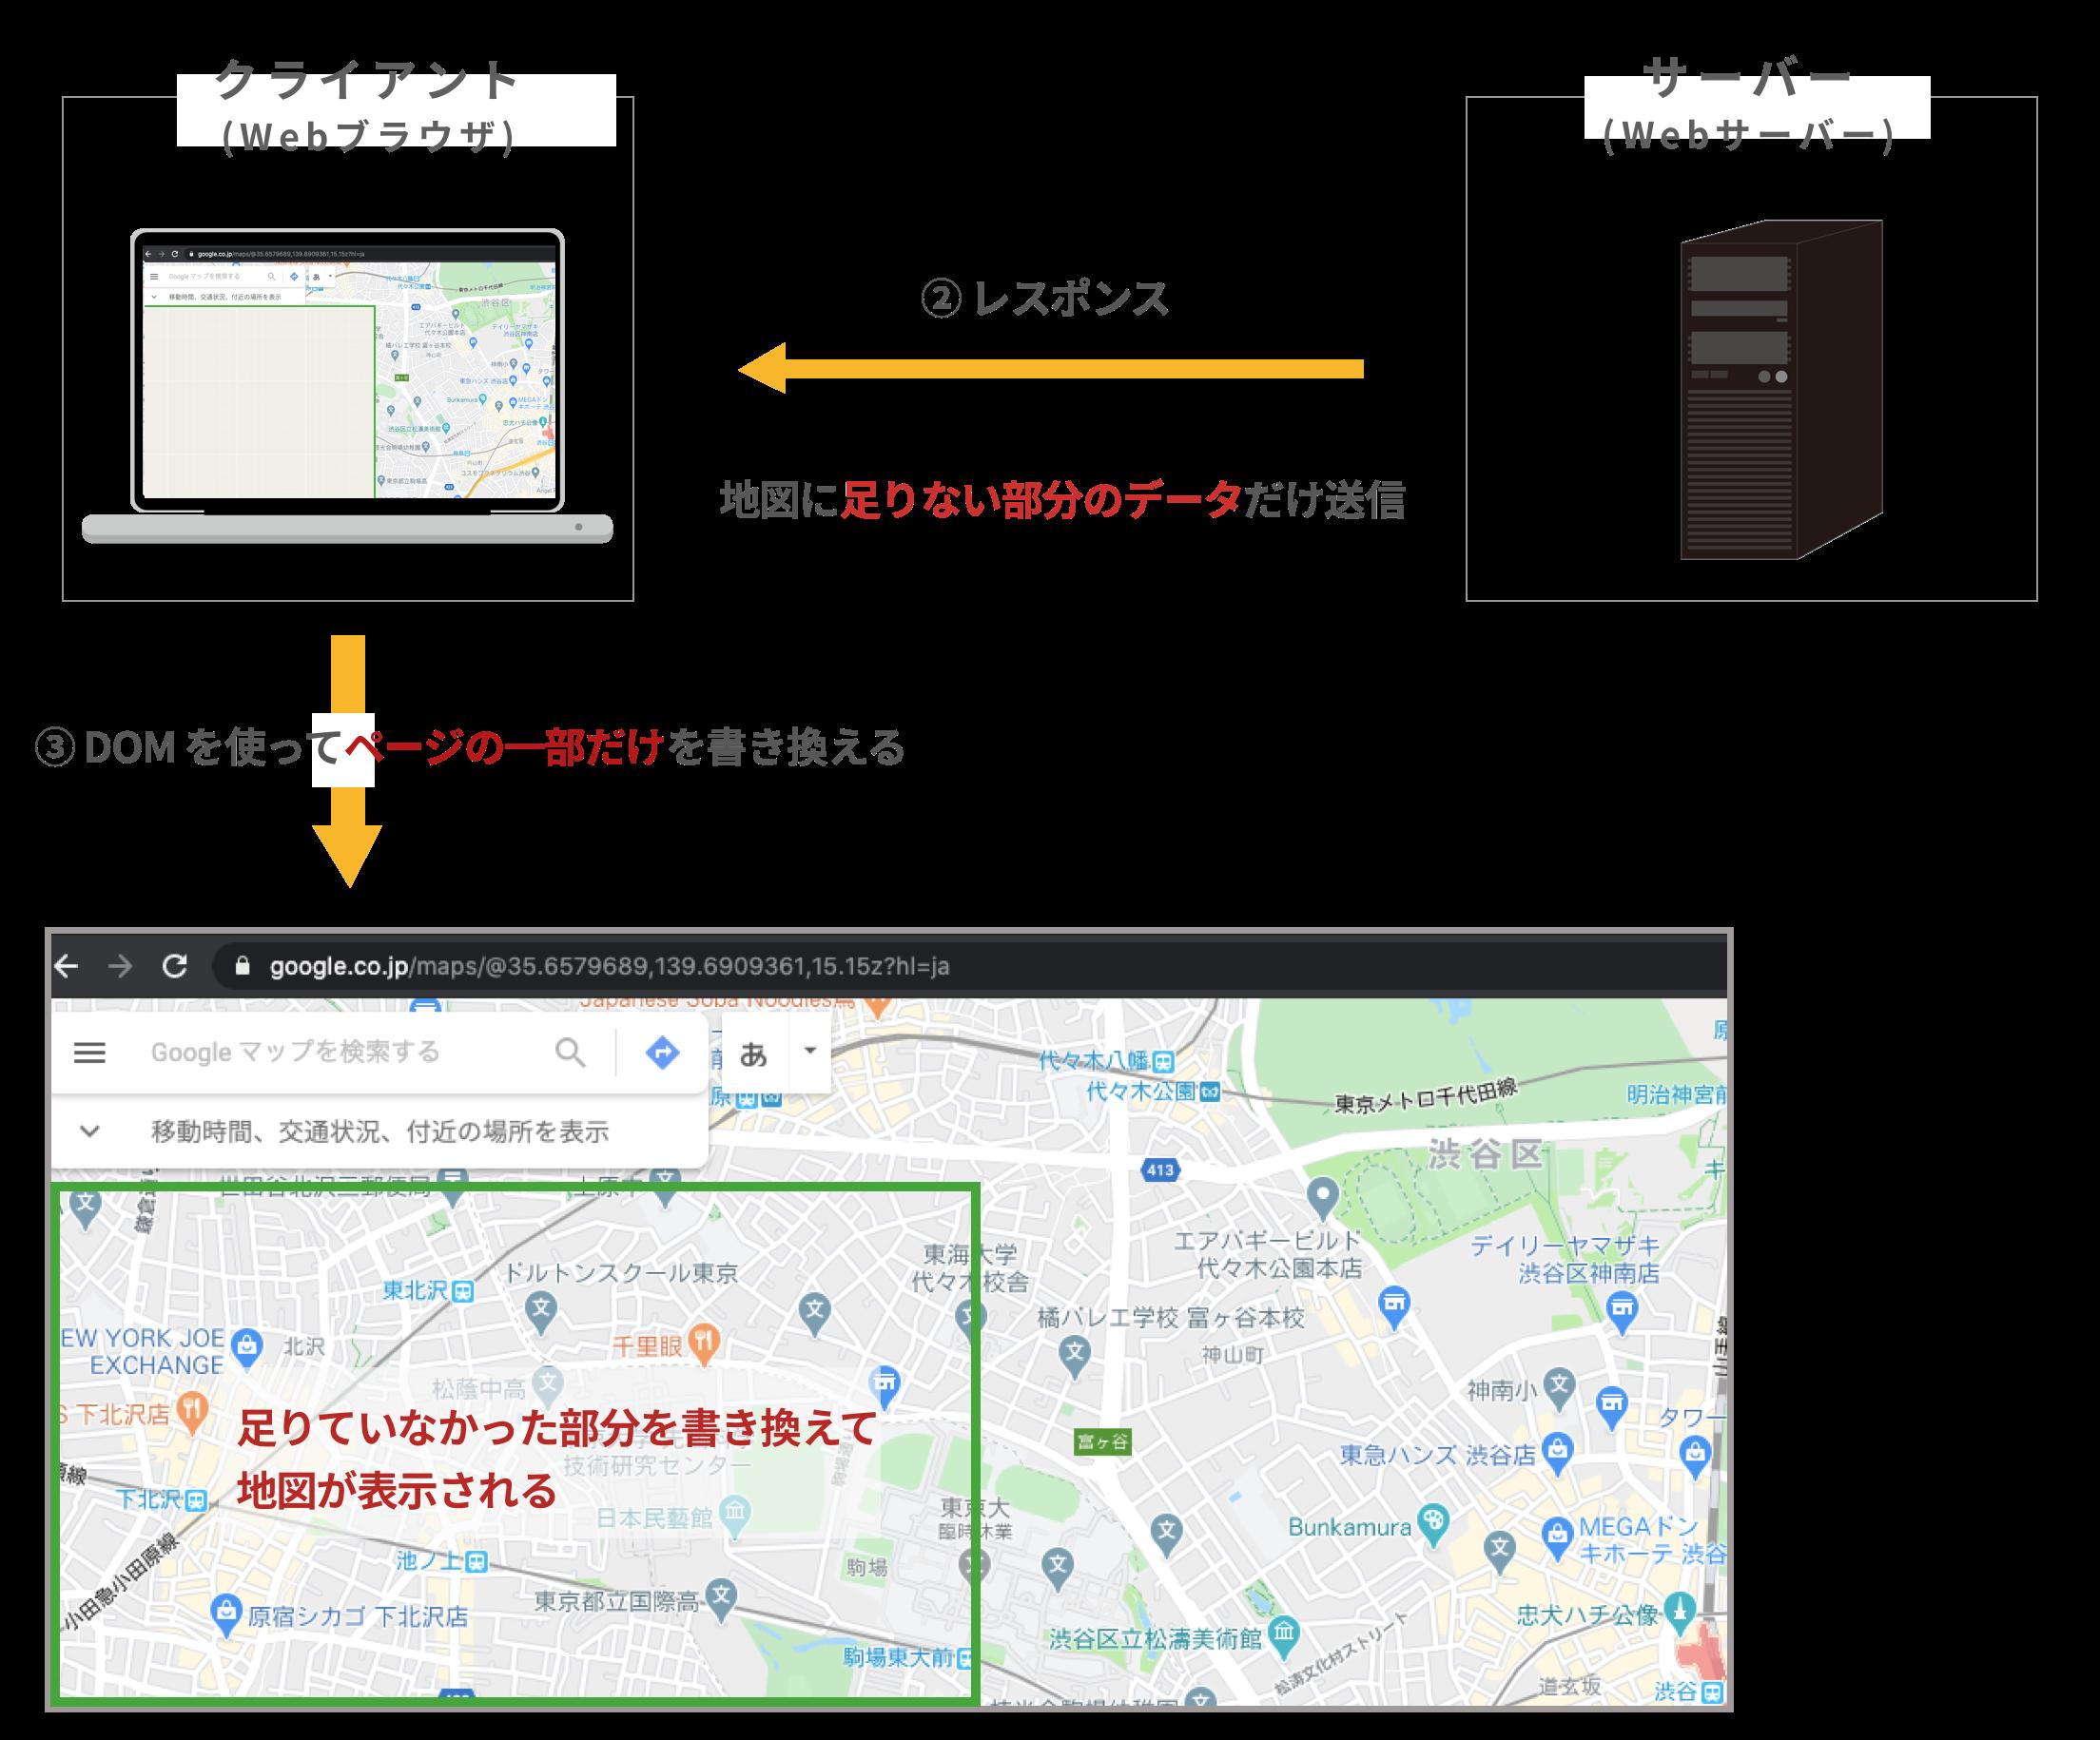 DOMで地図の一部を書き換えている例